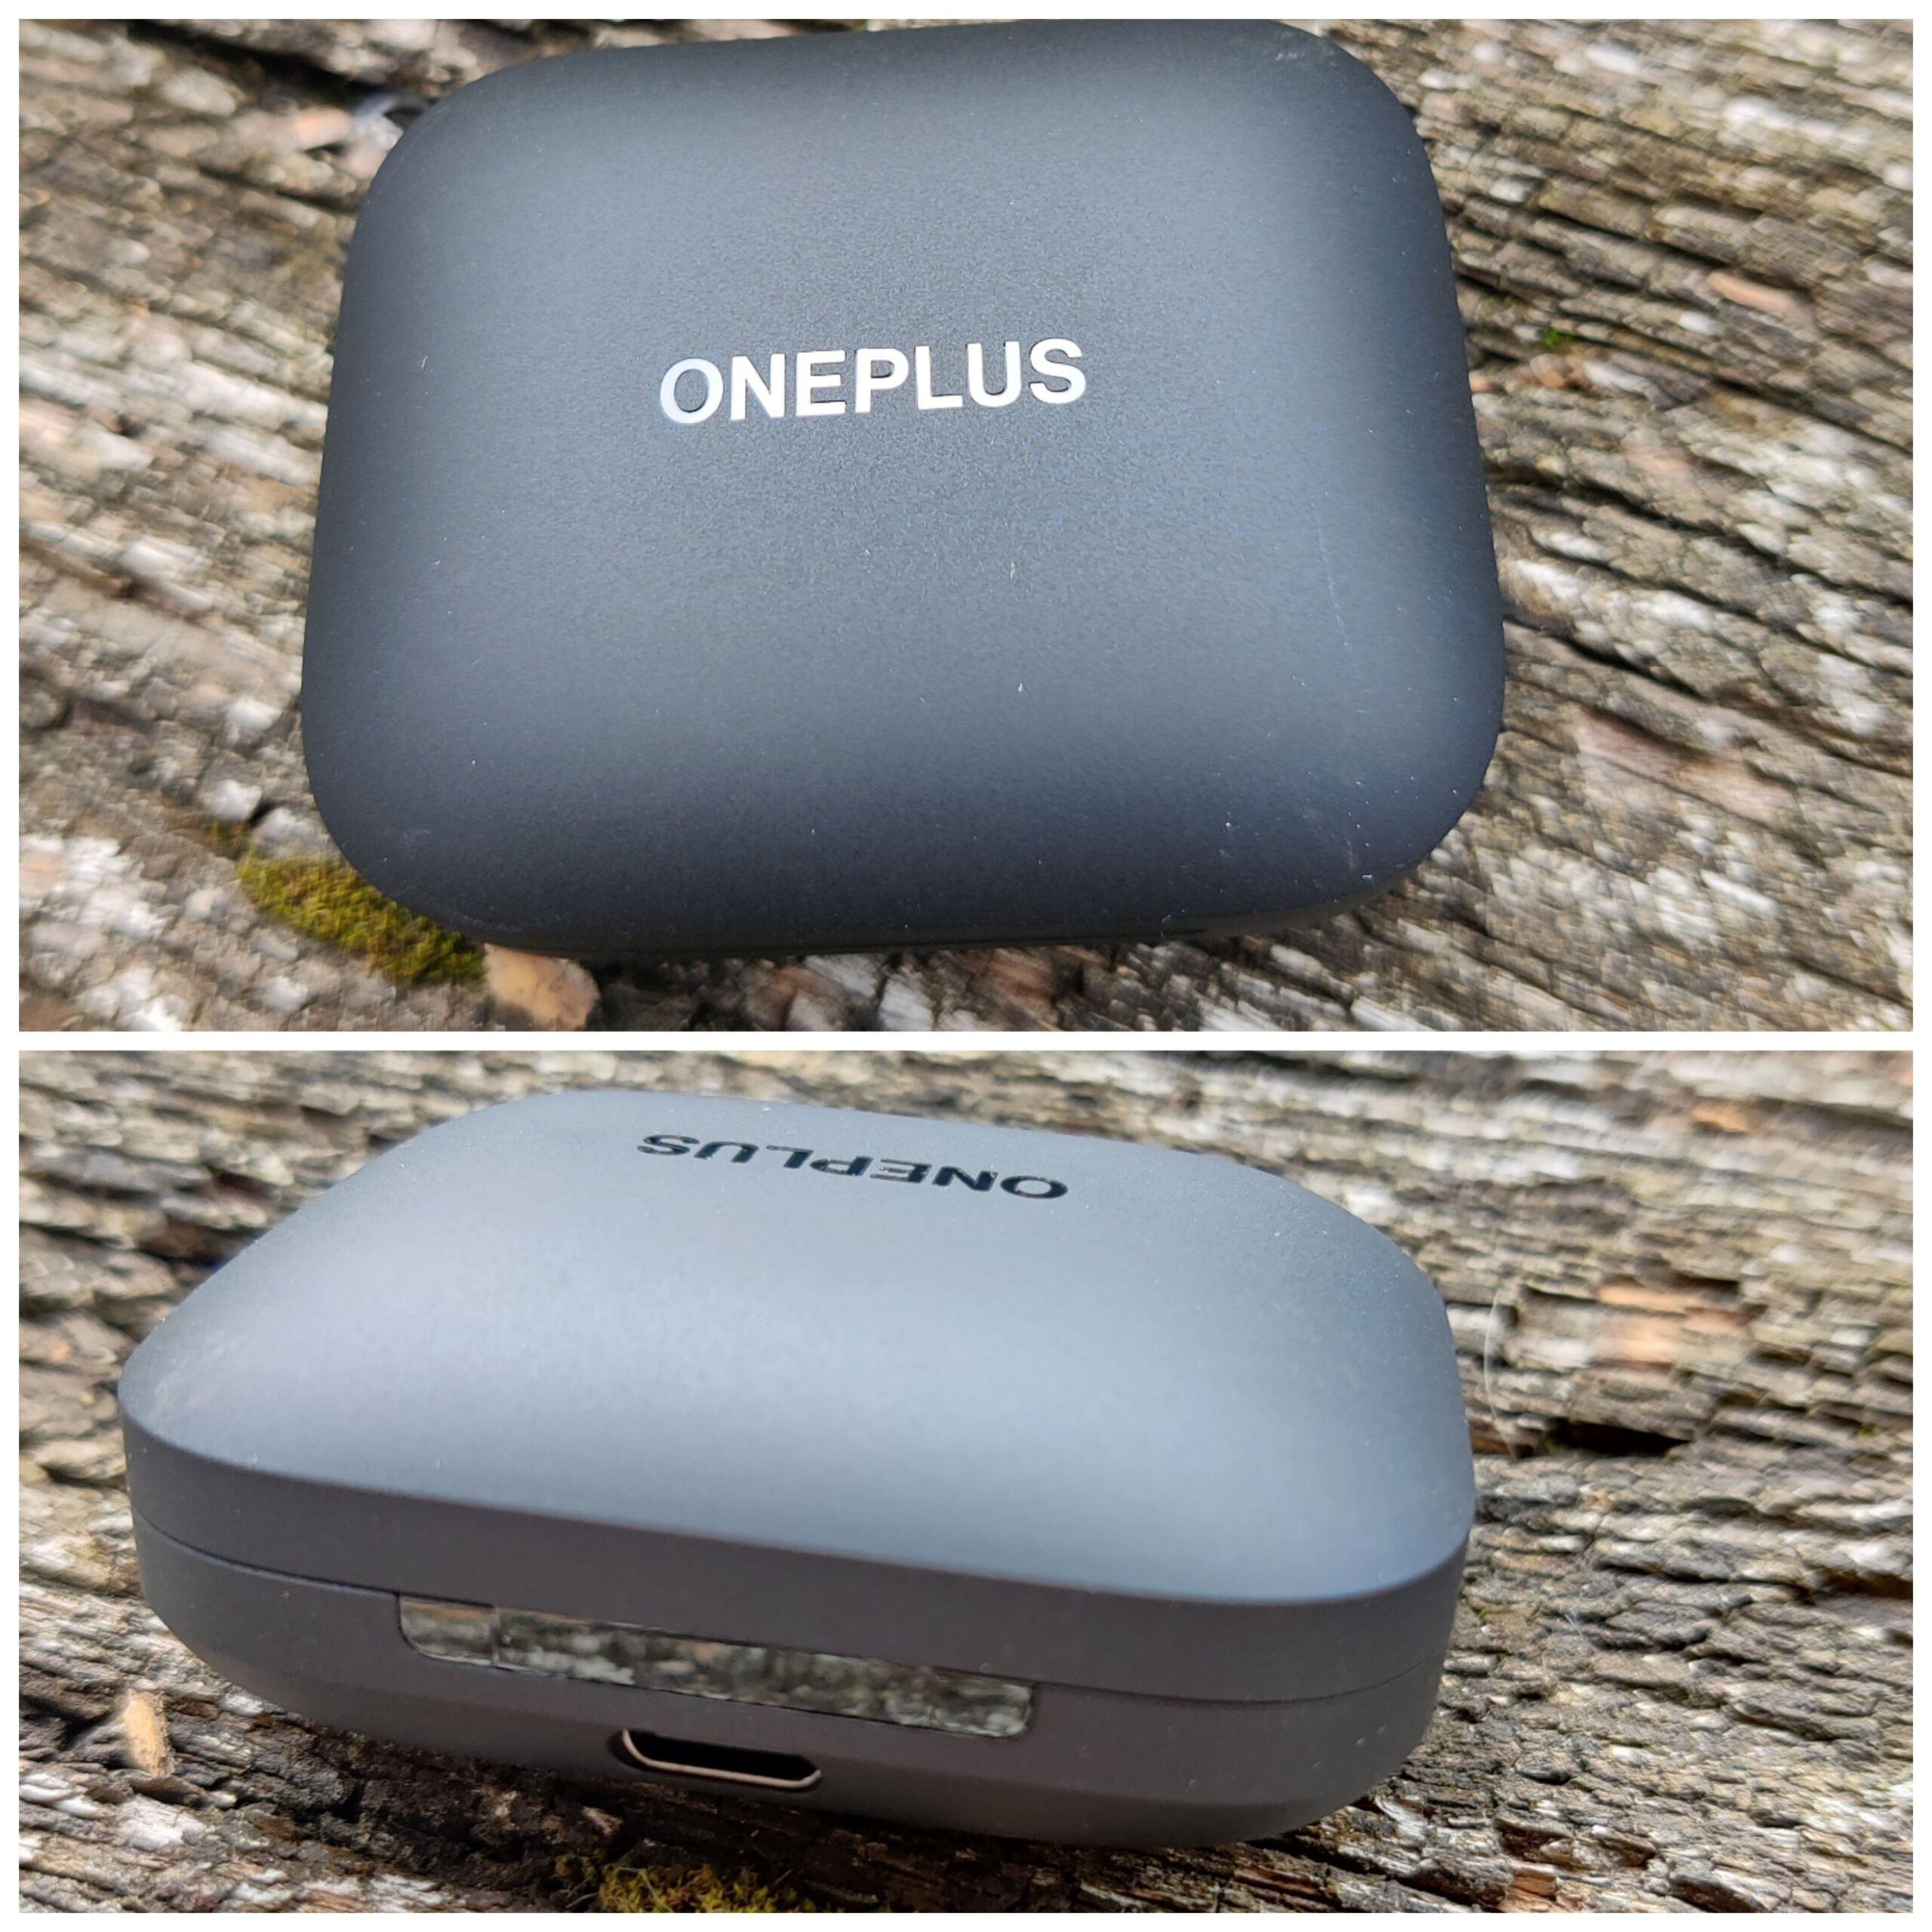 OnePlus Buds Pro boîte différents angles